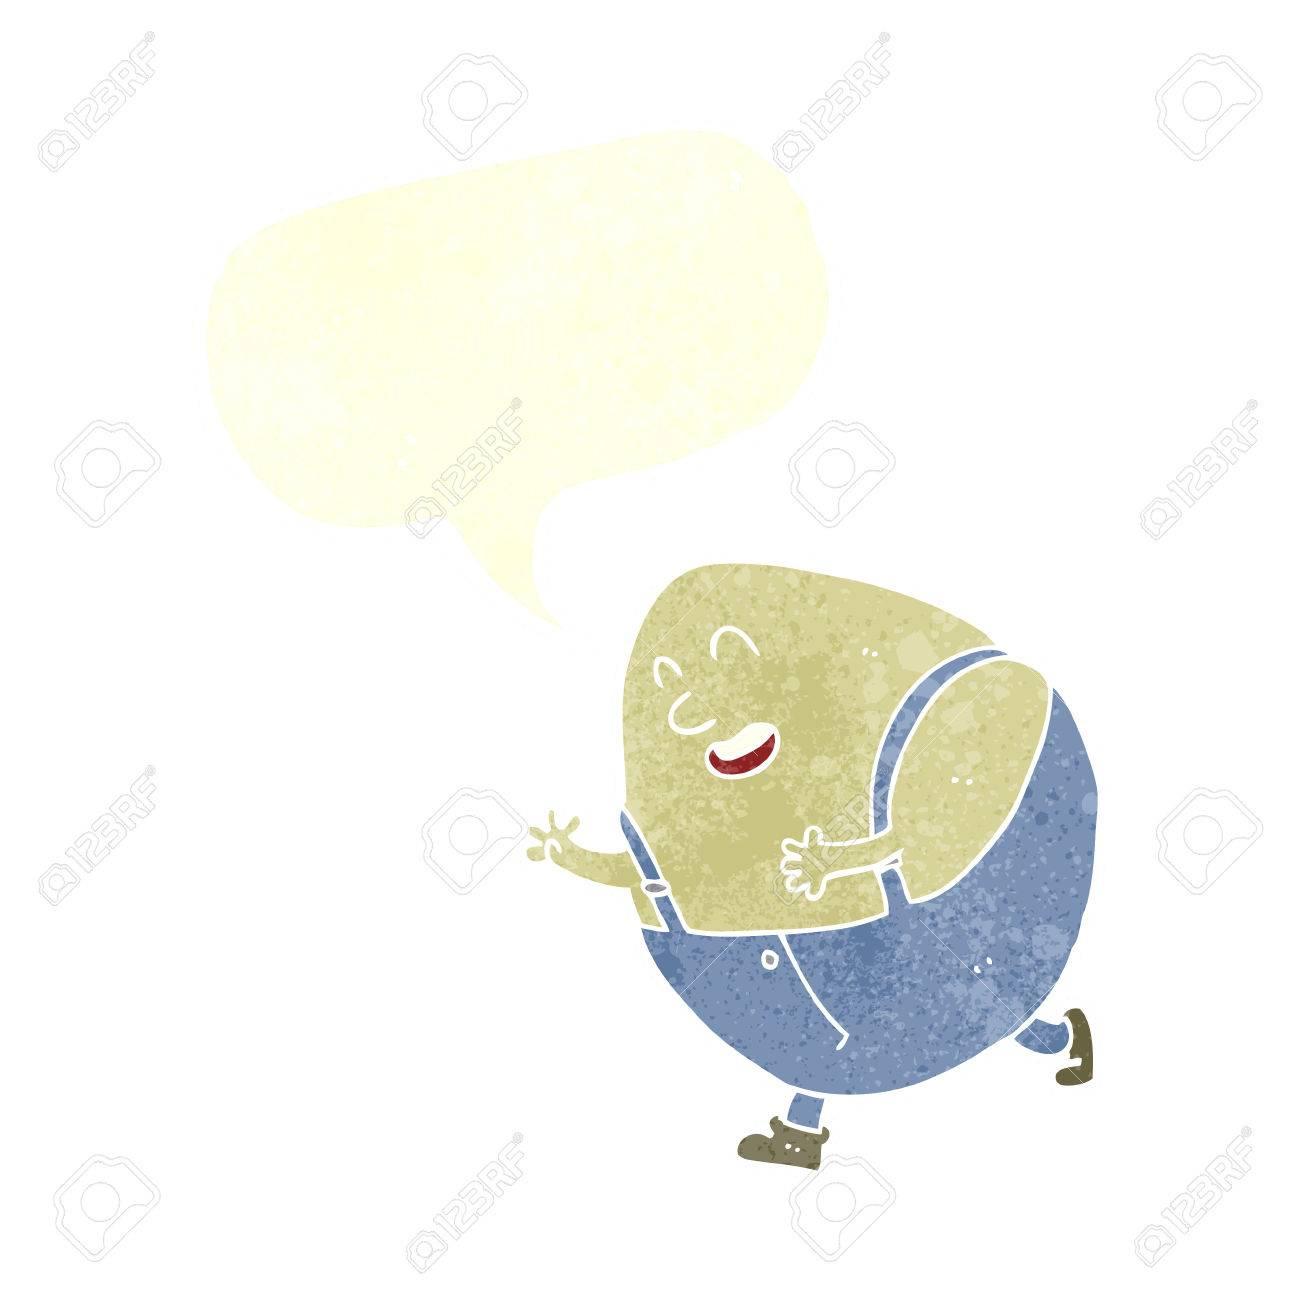 Humpty Dumpty De Personnage De Dessin Animé D'oeuf Avec Bulle serapportantà Dessin D Oeuf